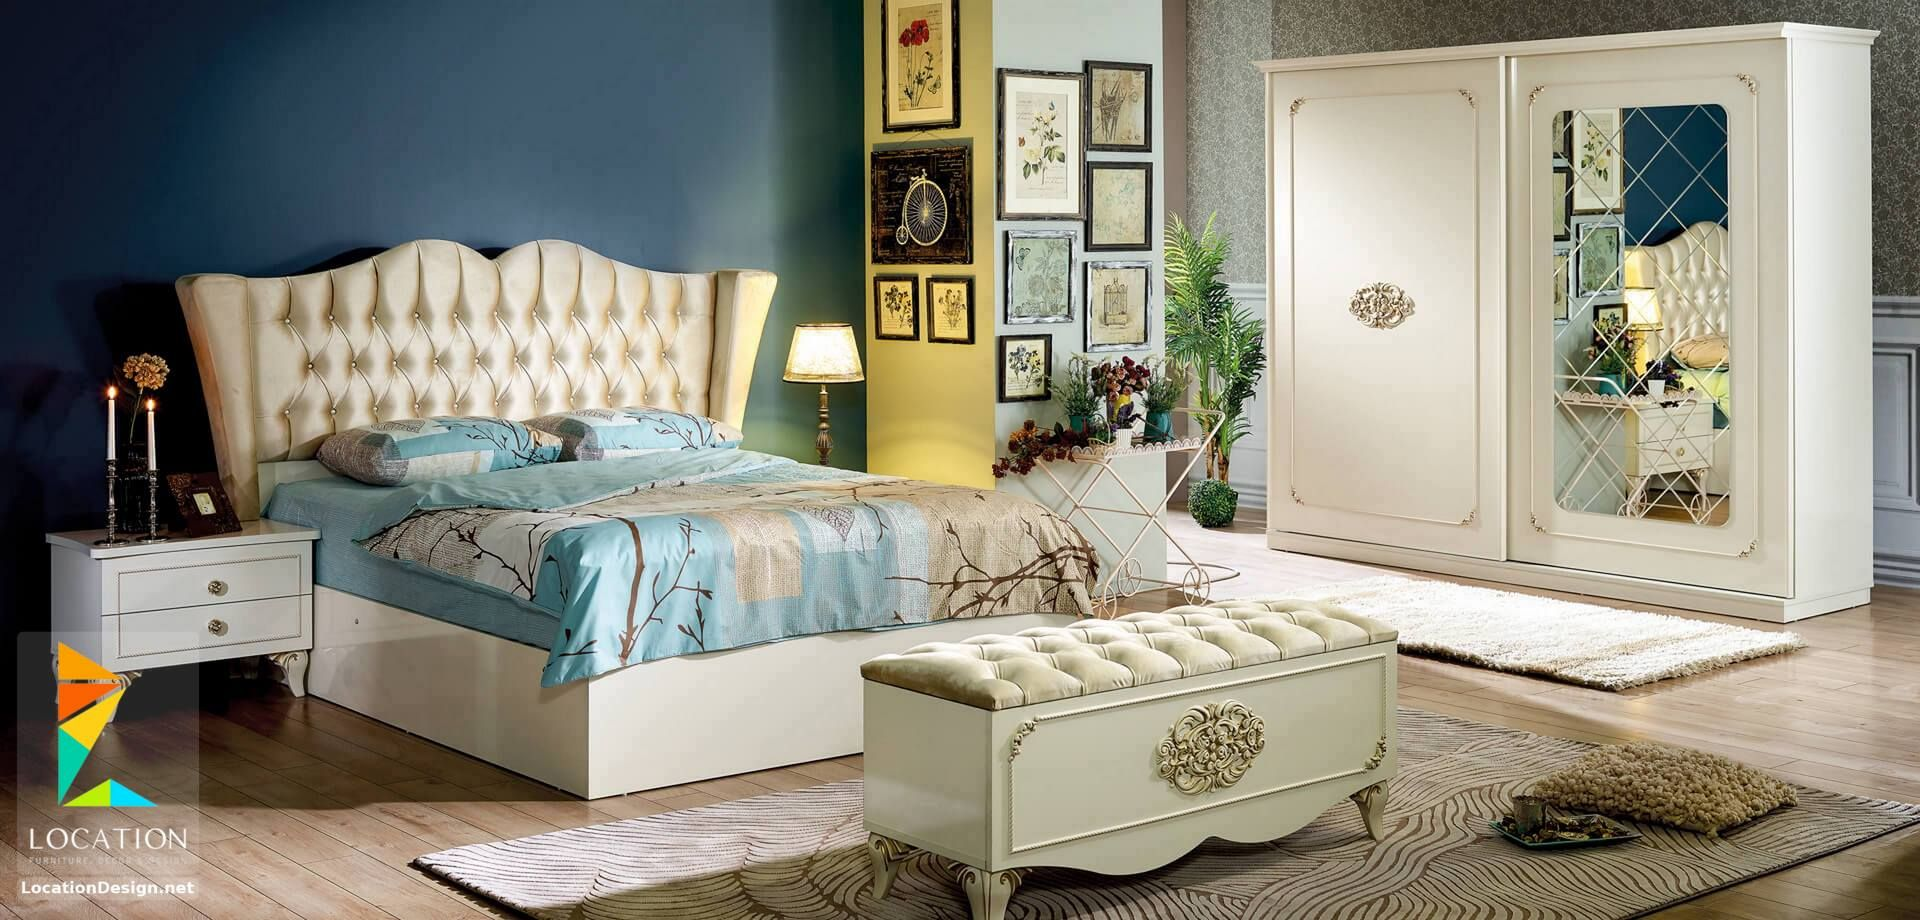 صور غرف نوم 2019 كامله احدث تصميمات غرف النوم للعرسان لوكشين ديزين نت Furniture Home Decor Decor